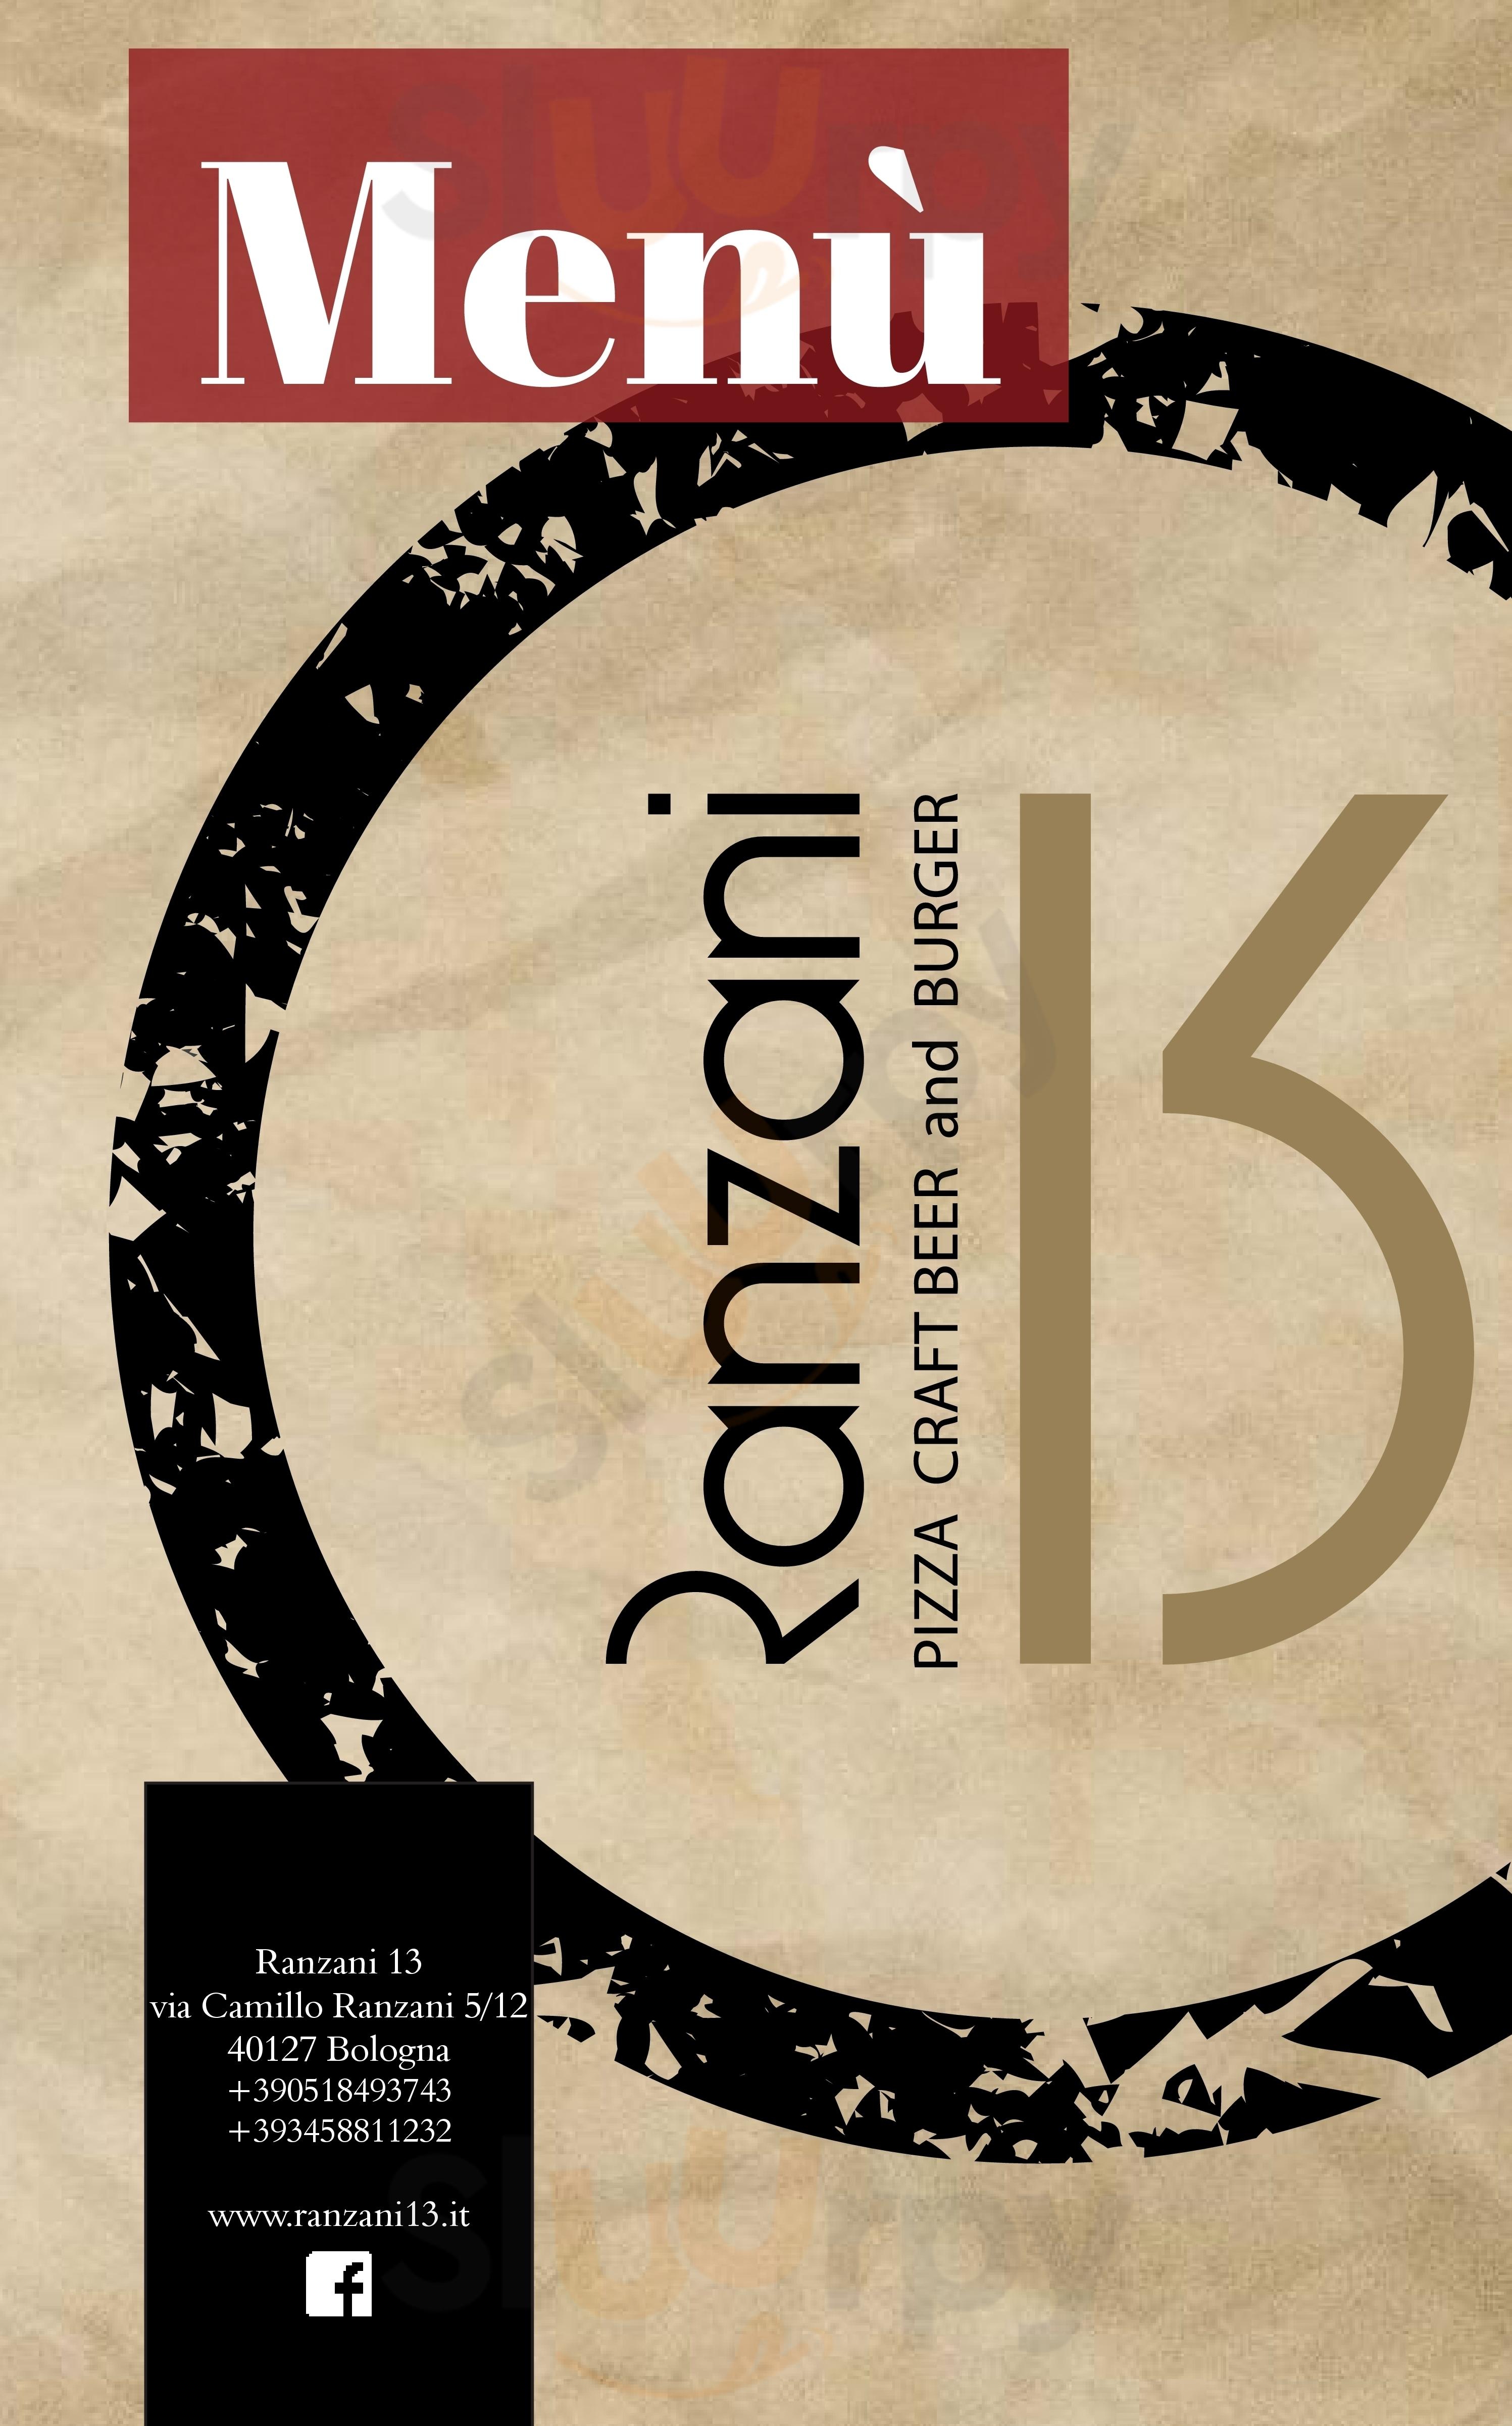 Ranzani 13 Bologna menù 1 pagina